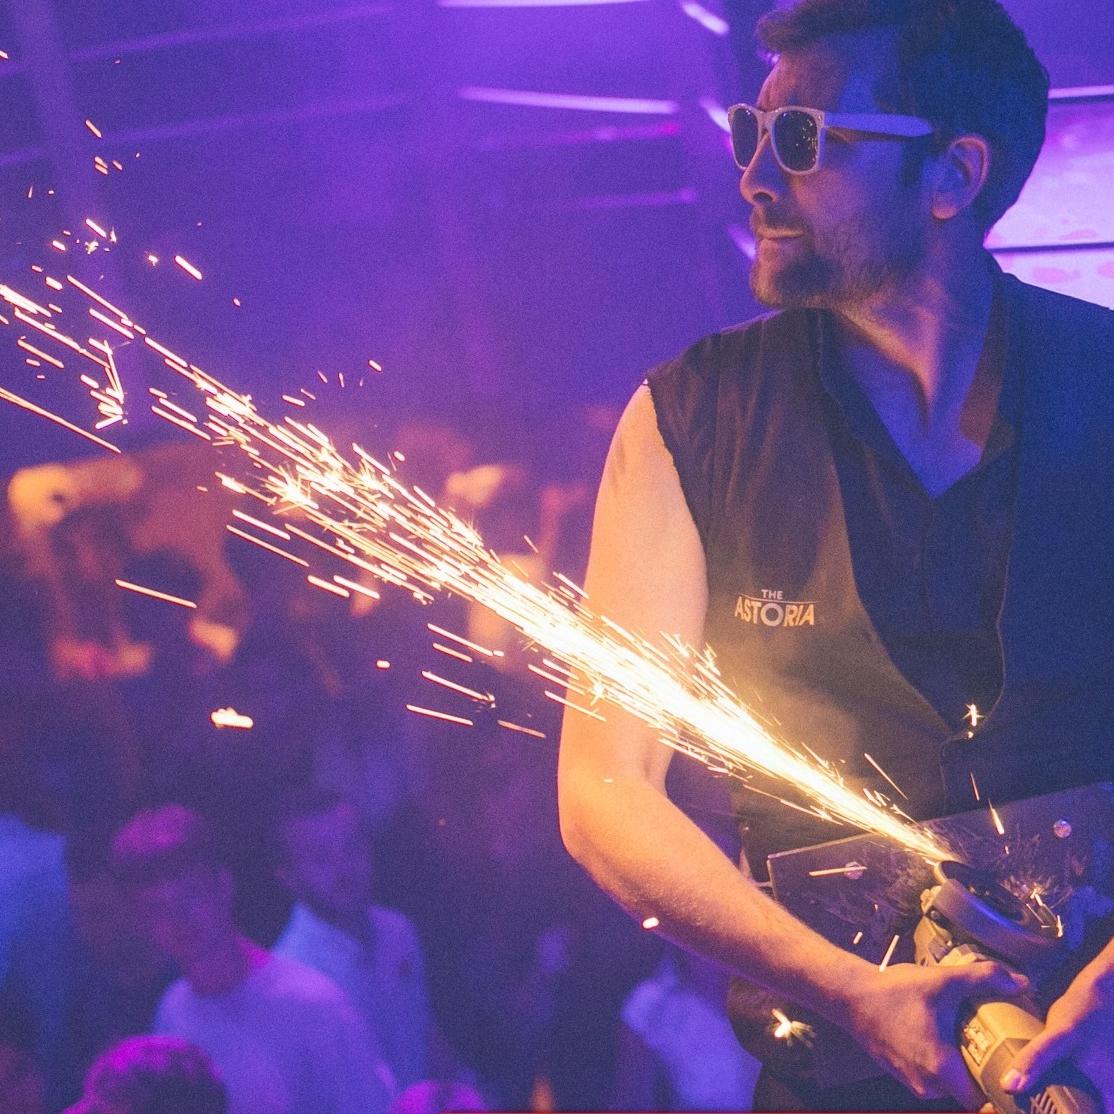 the astoria nightclub -